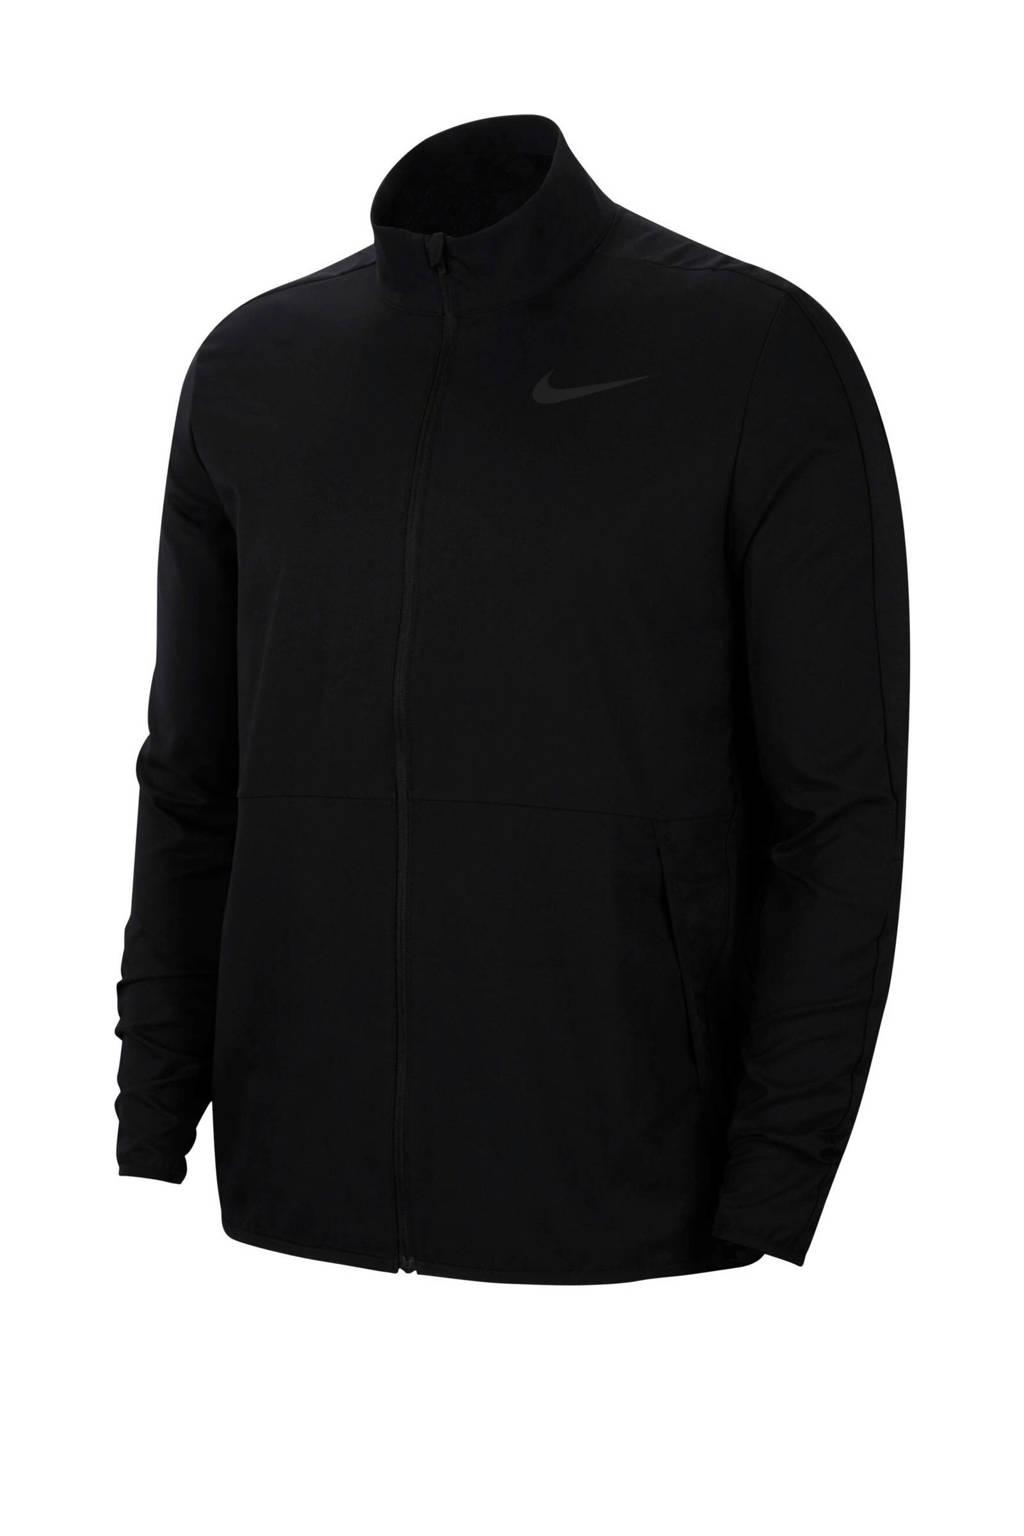 Nike   sportjack zwart, Zwart